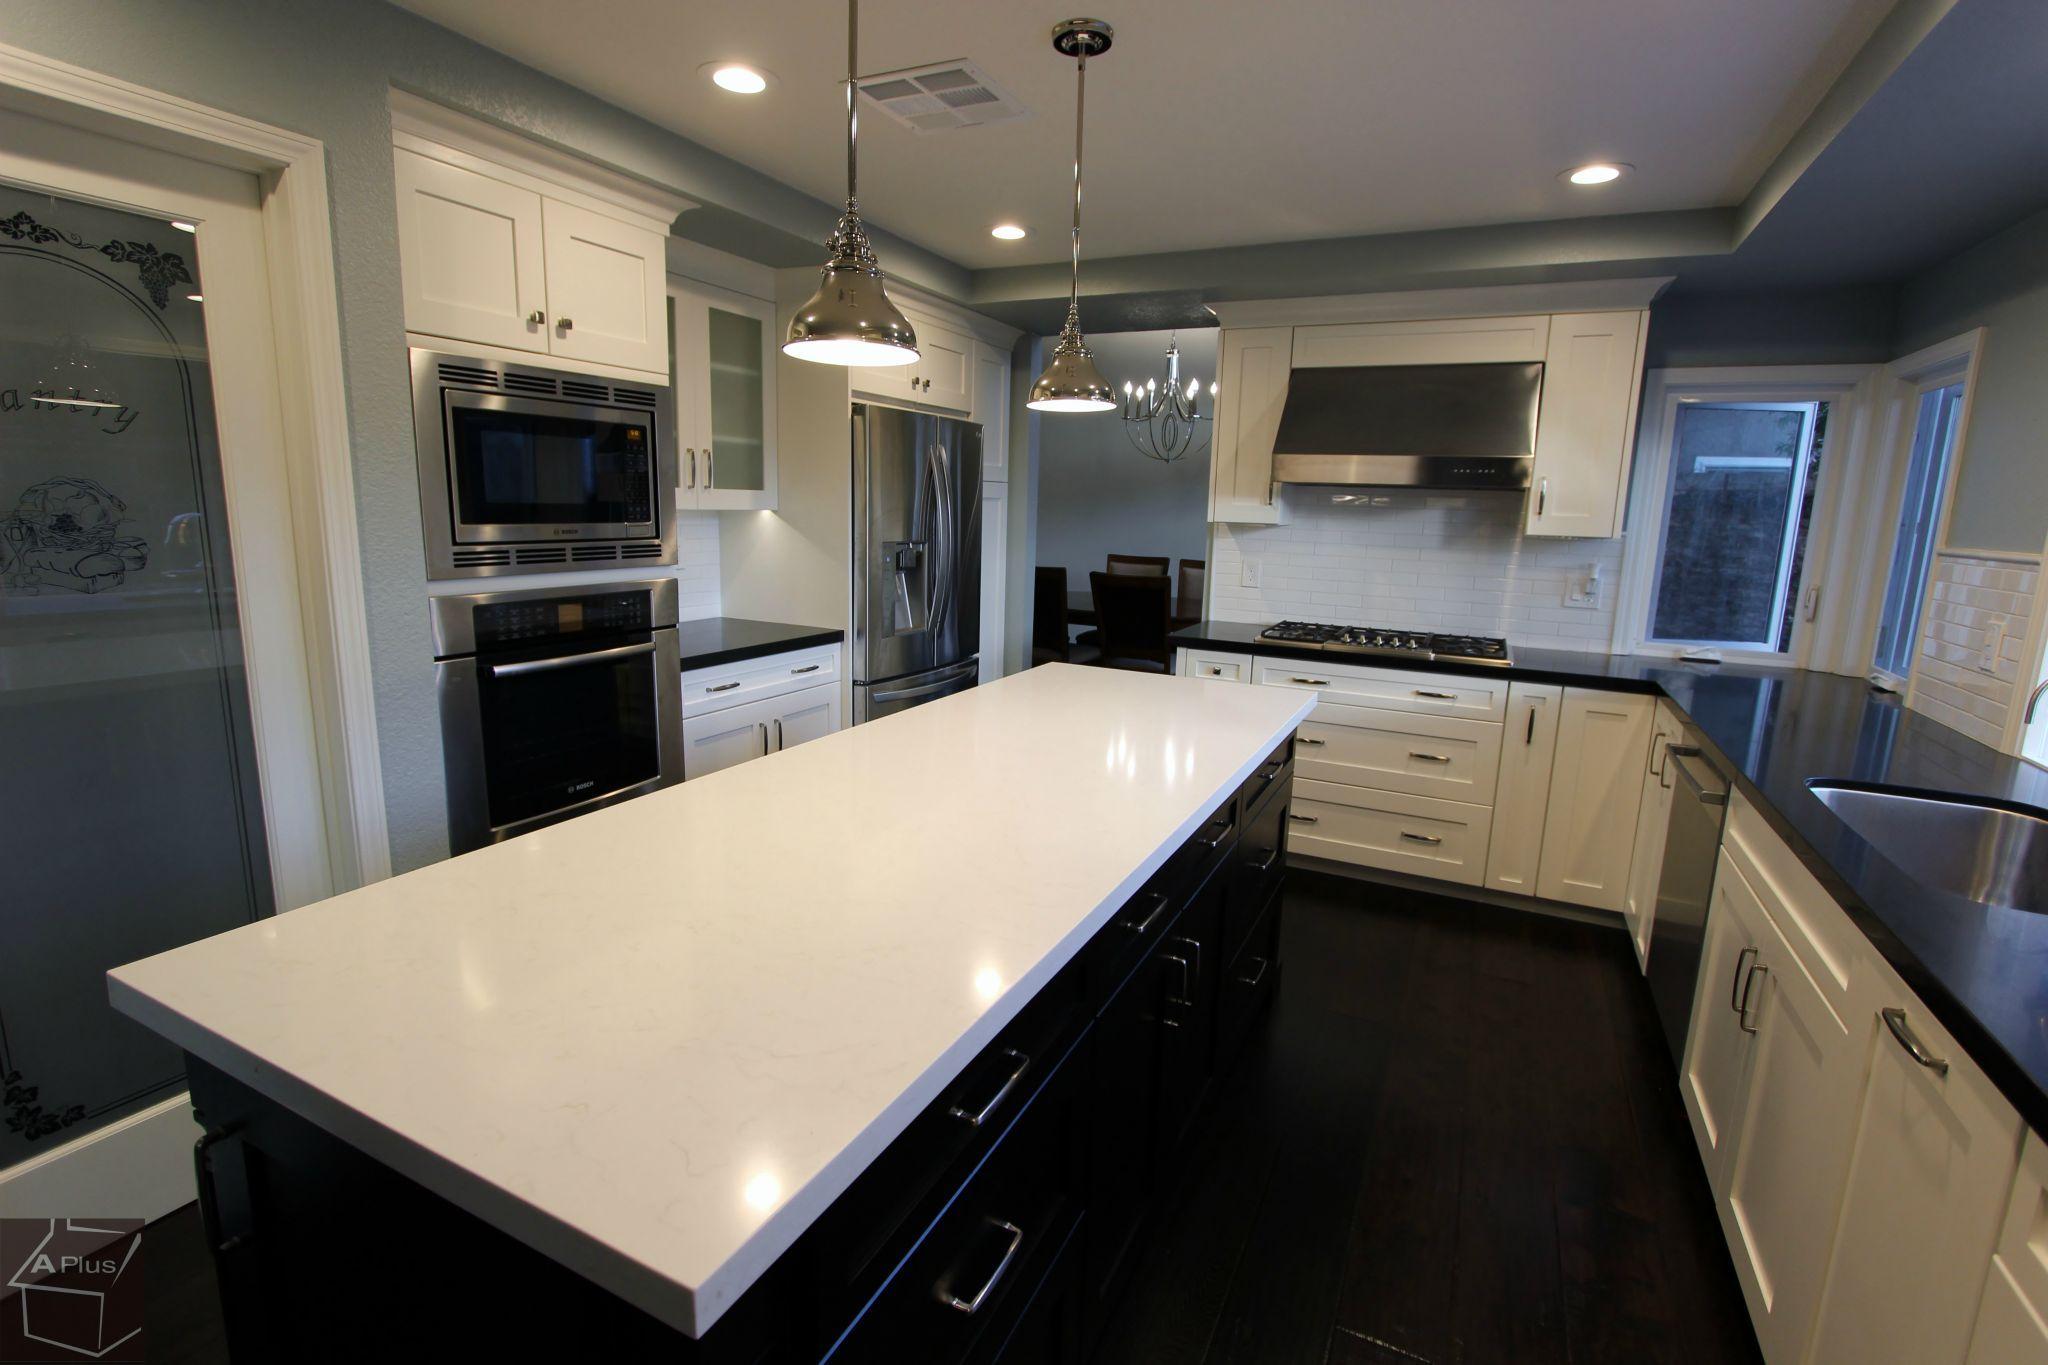 Design Build Kitchen Remodel With Custom Cabinets In Irvine Orange County California Kitchen Remodel Home Kitchens Kitchen Design